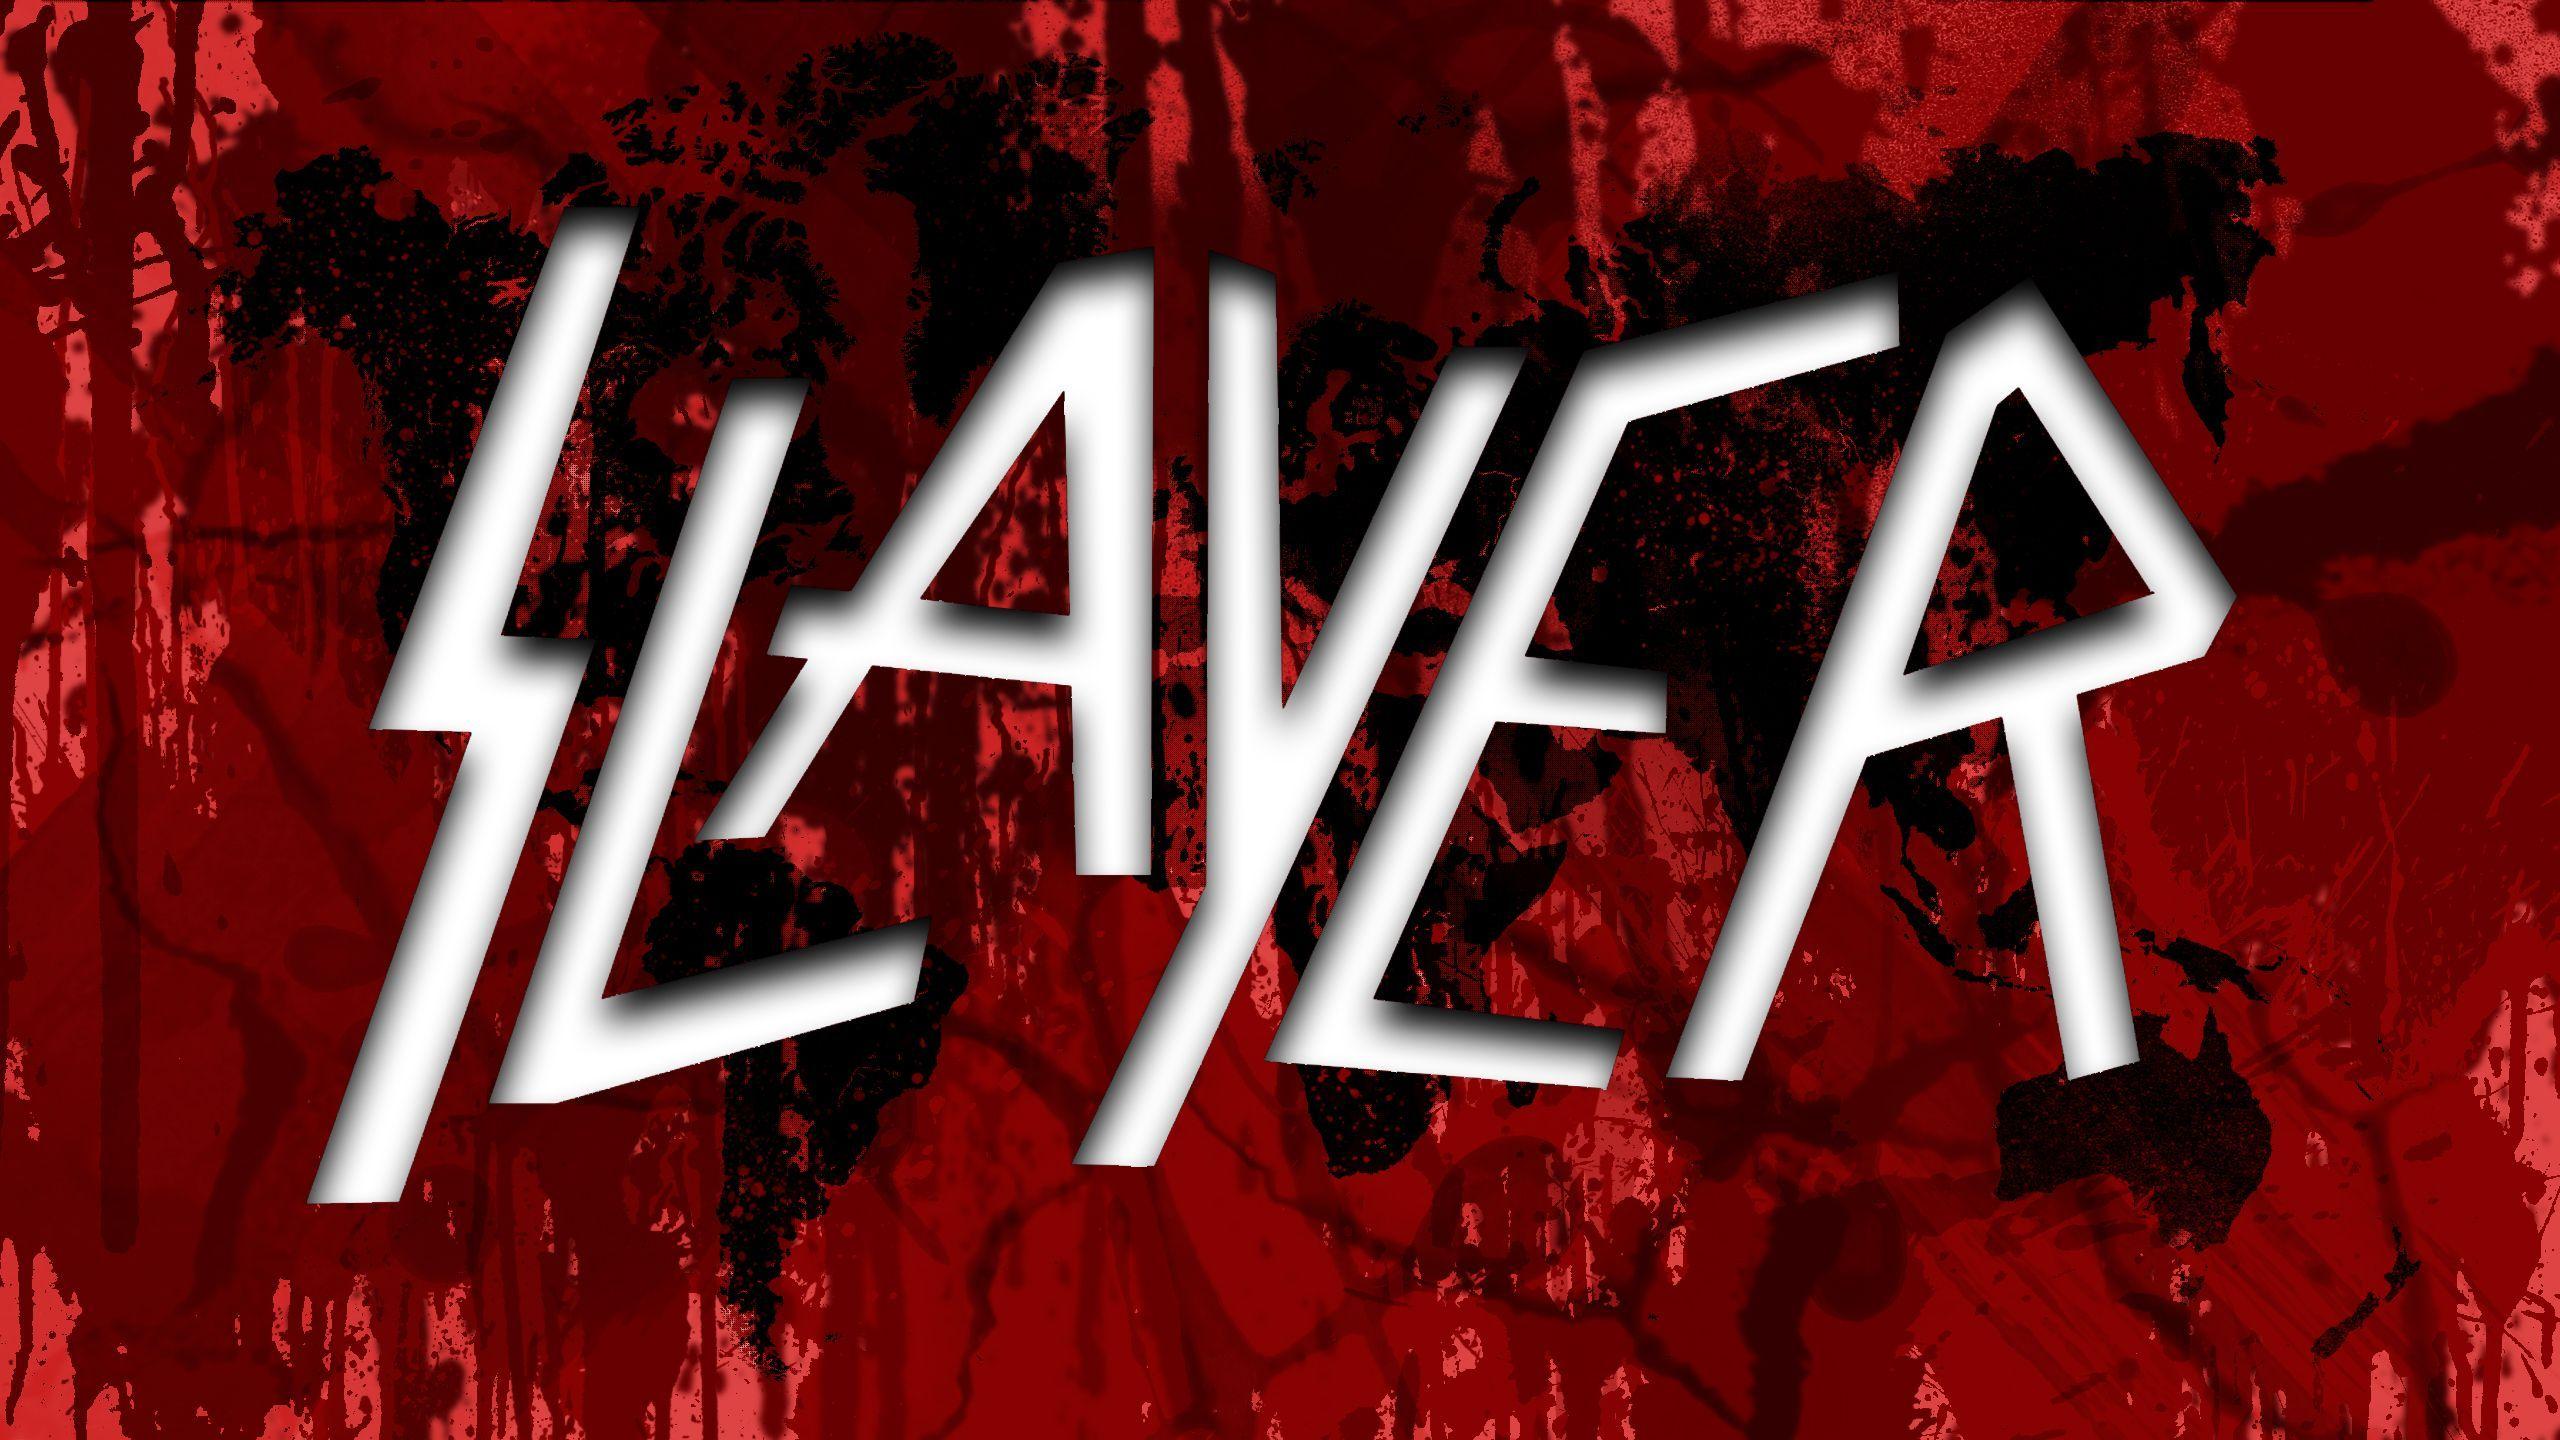 High Res Anime Wallpaper Free Download Slayer Band Wallpapers Pixelstalk Net